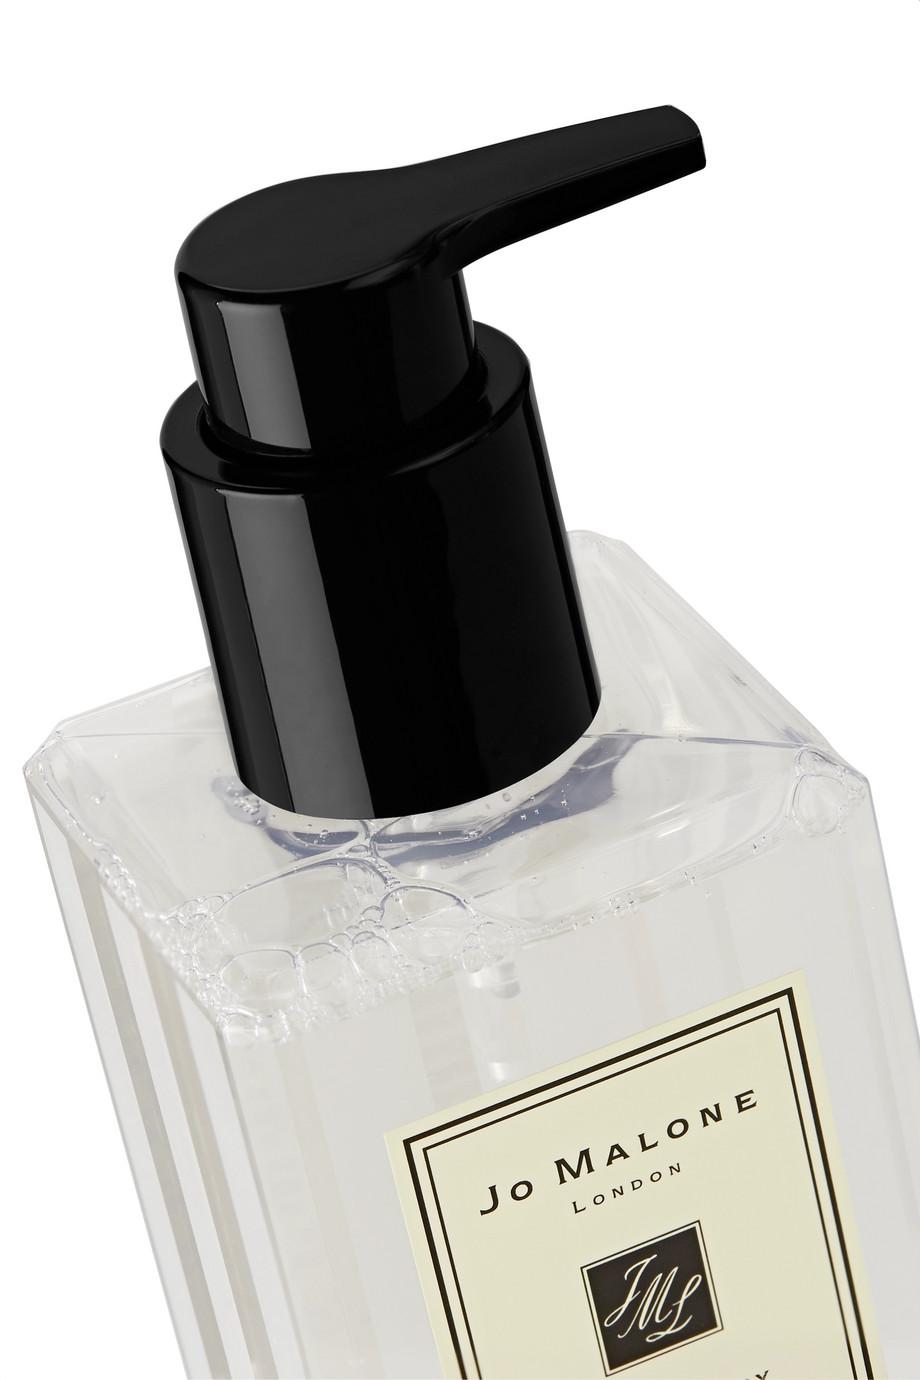 Jo Malone London English Pear & Freesia Body & Hand Wash, 250ml